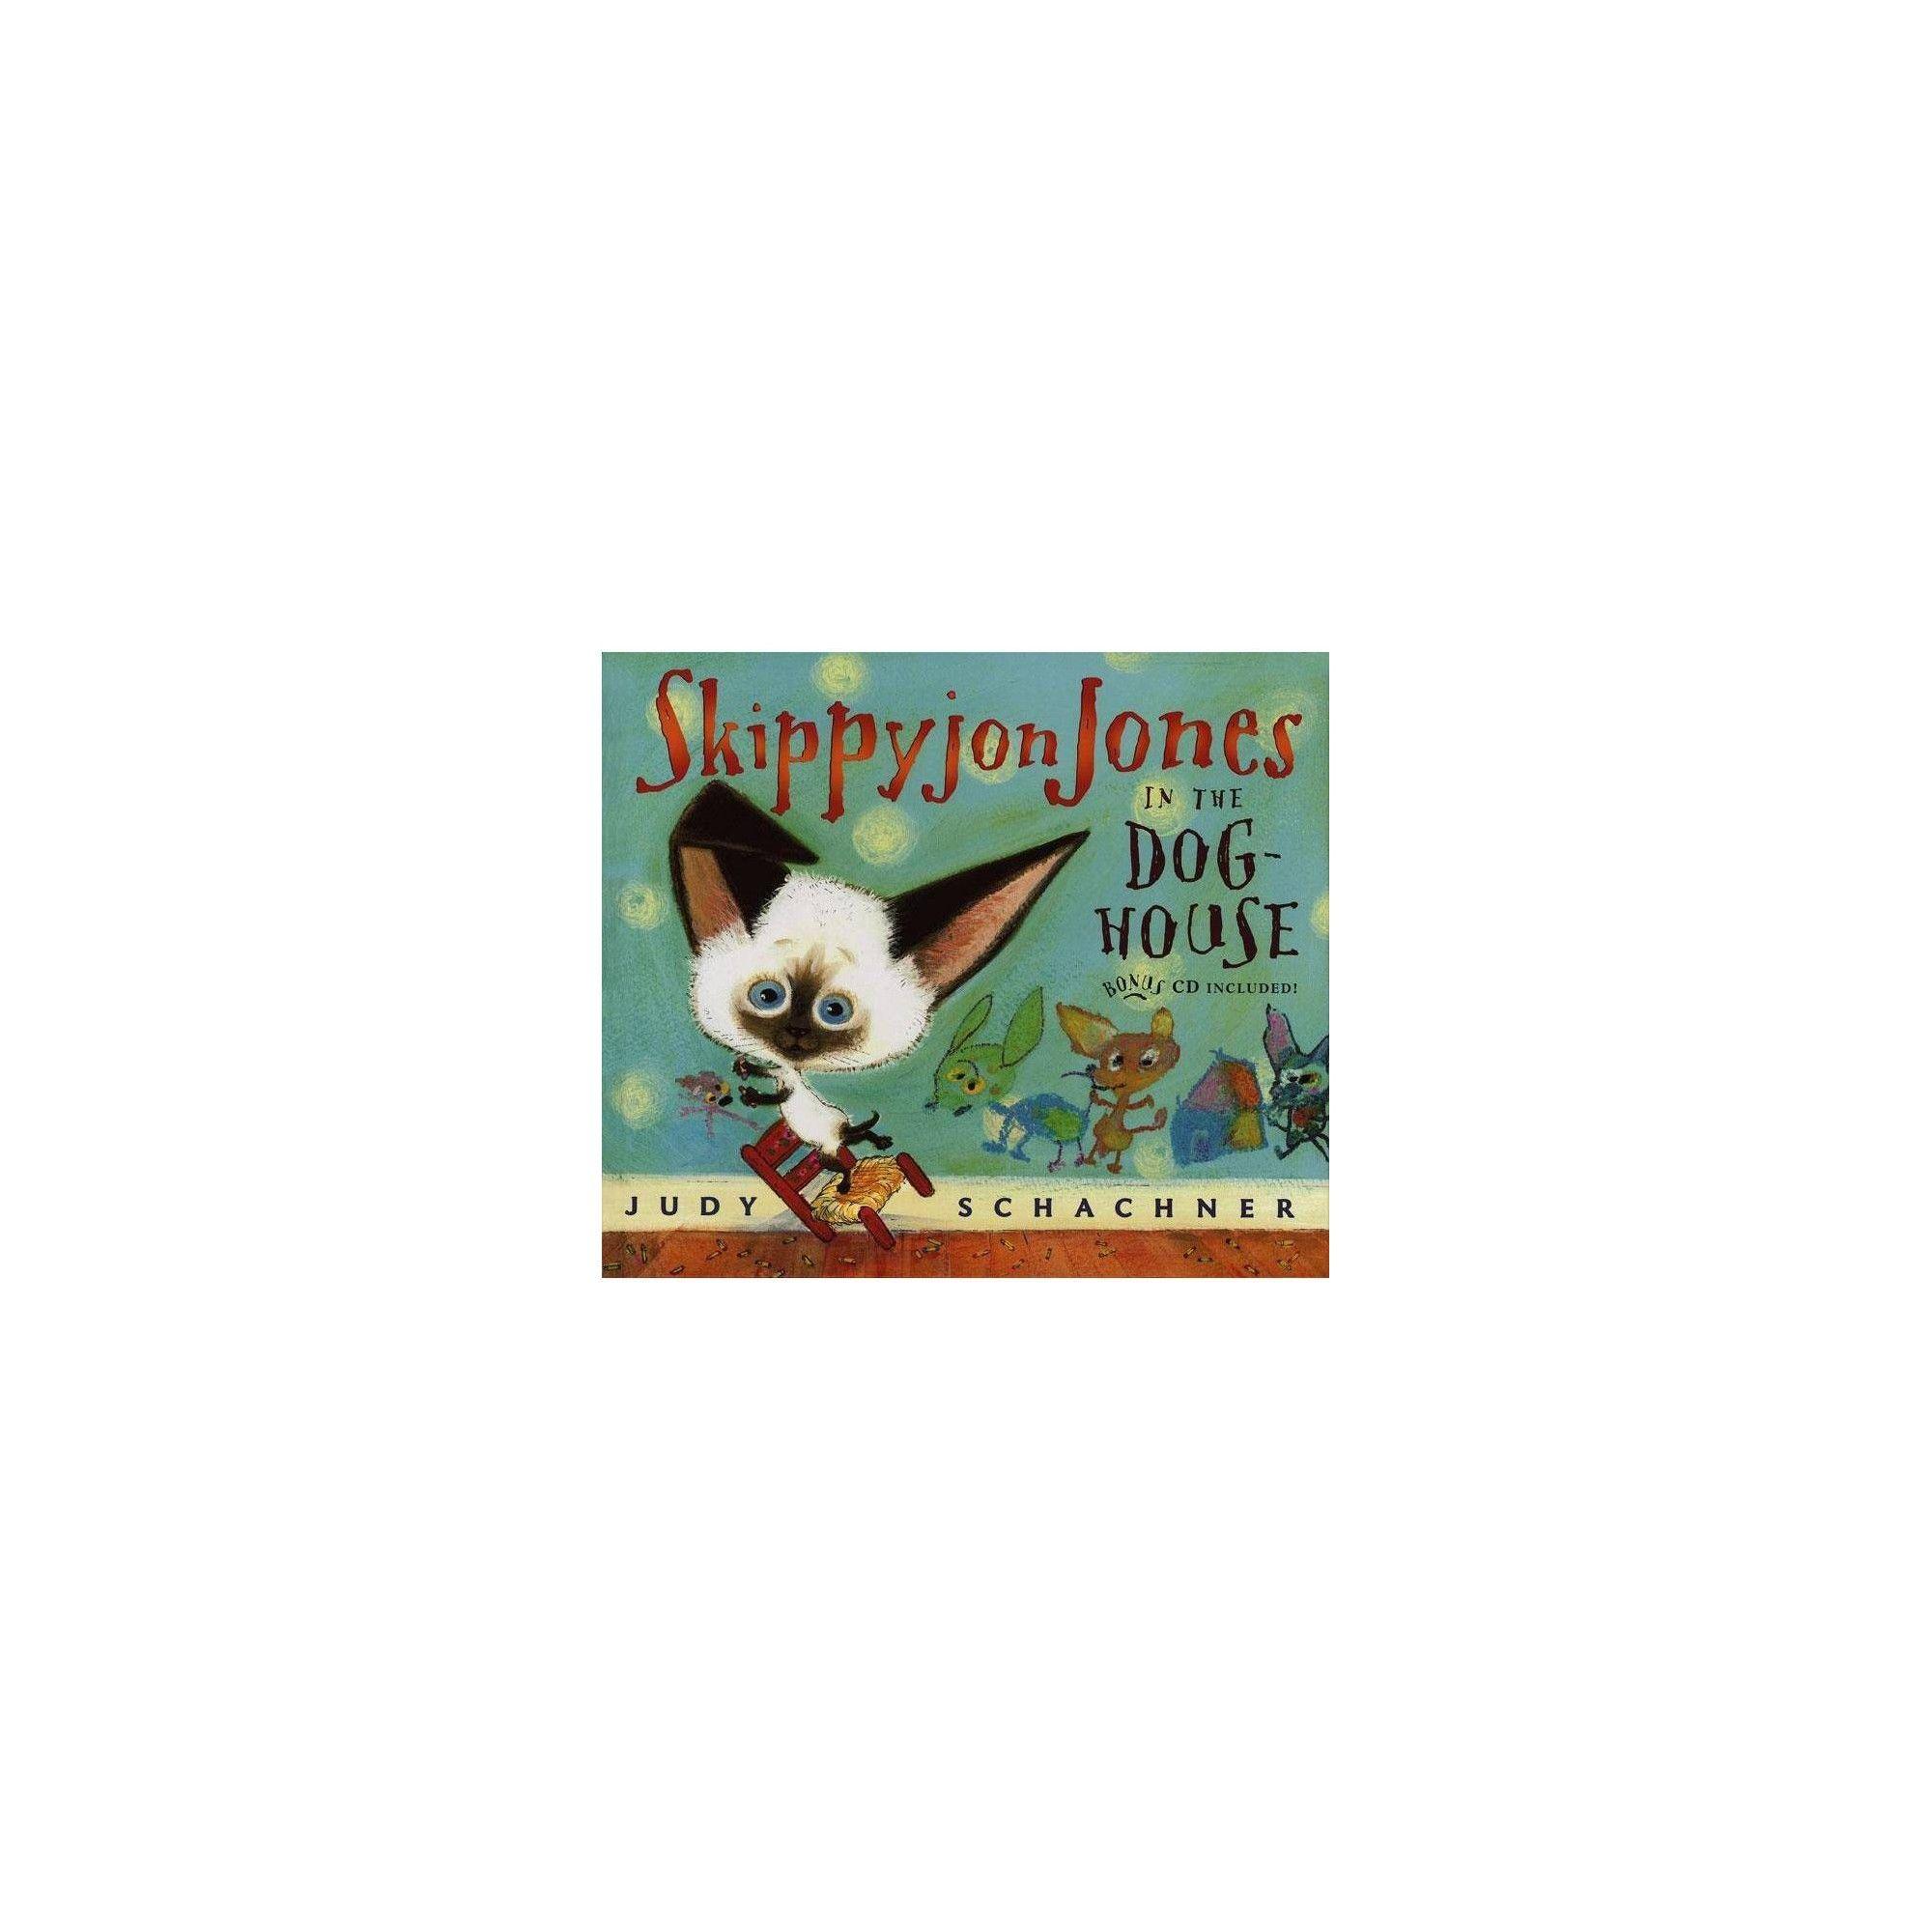 Skippyjon Jones In The Dog House By Judy Schachner Hardcover